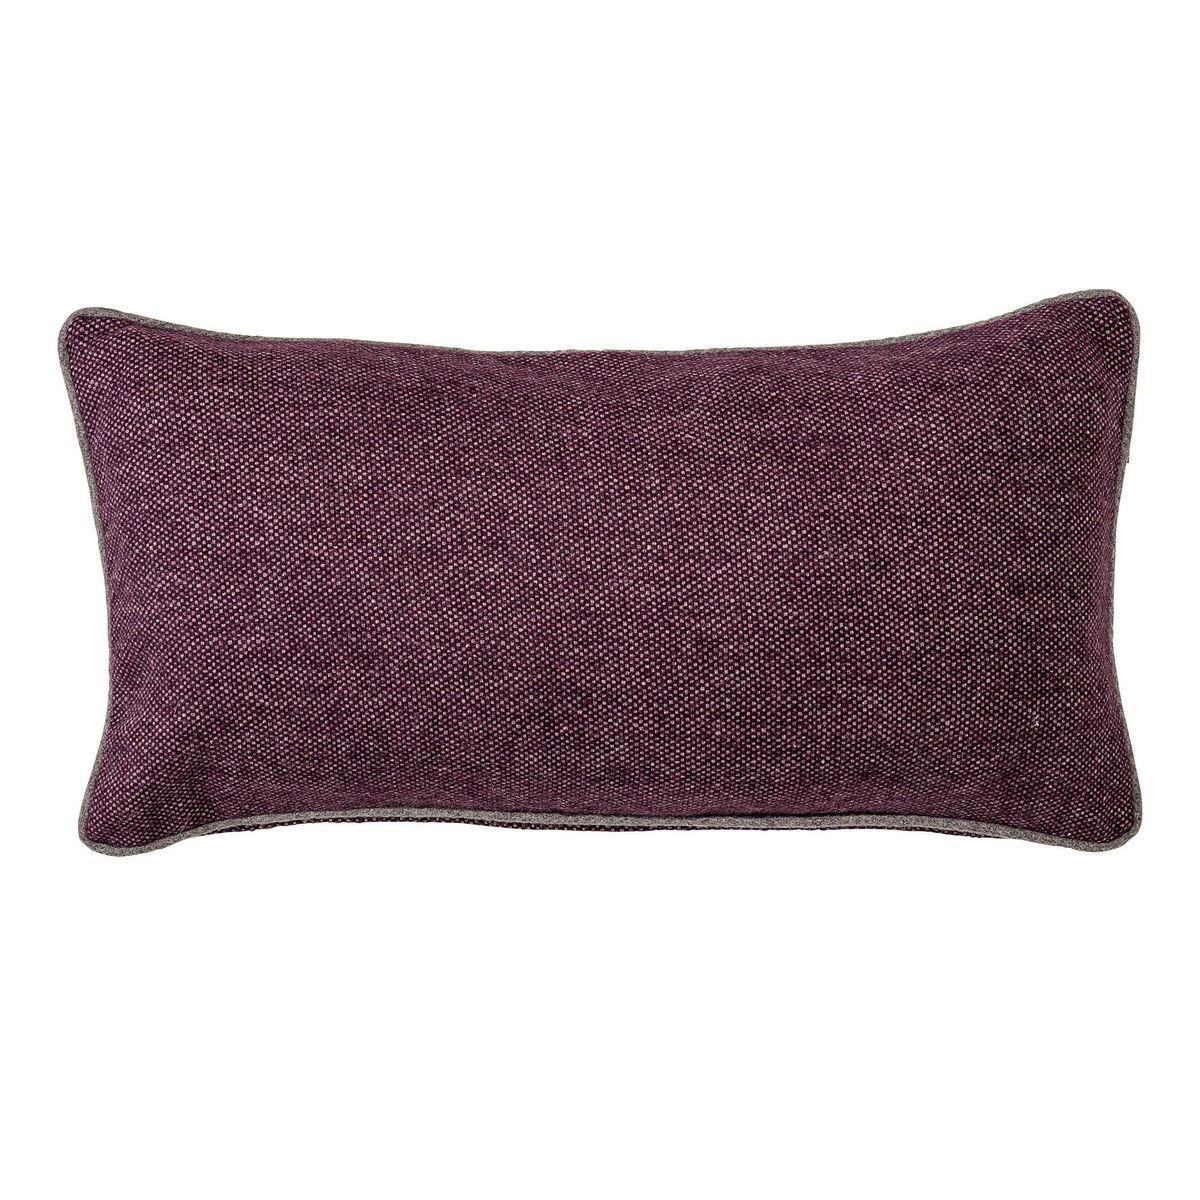 moon purple kissen bloomingville. Black Bedroom Furniture Sets. Home Design Ideas